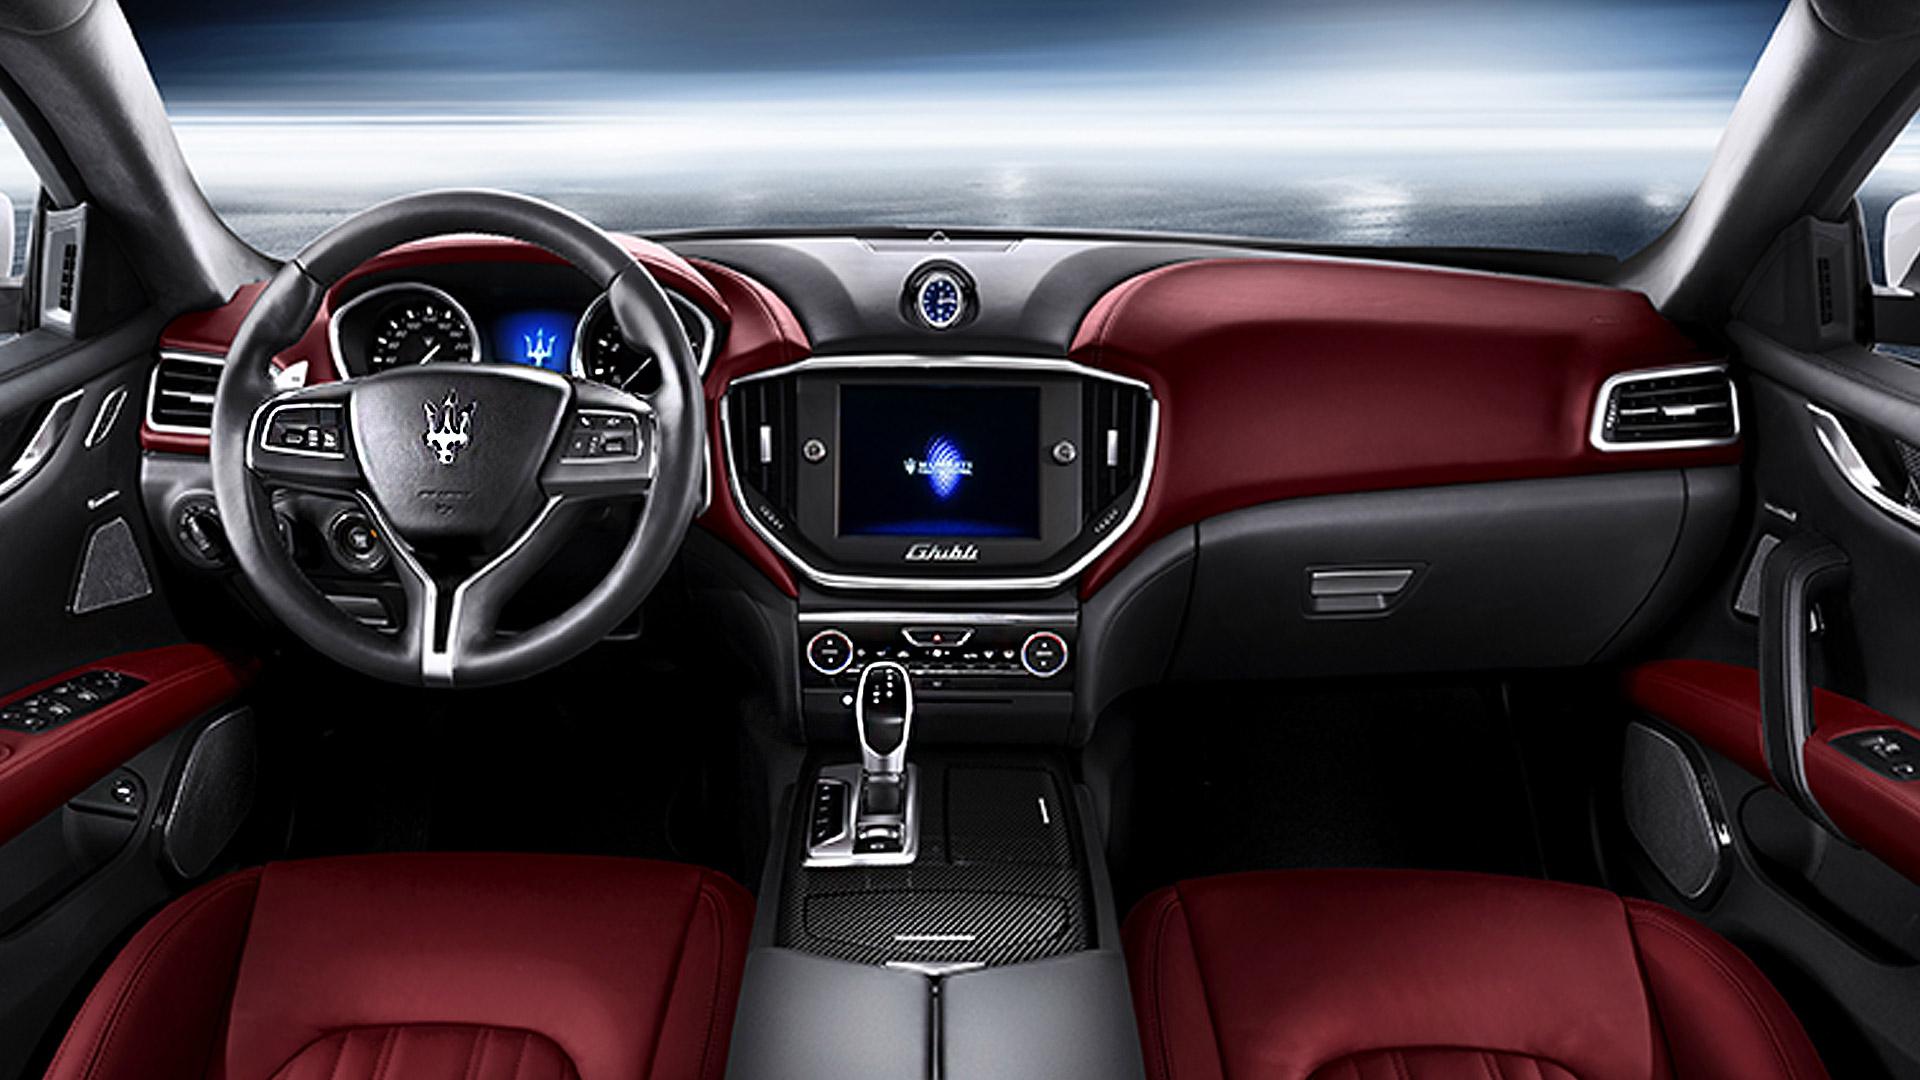 Maserati Ghibli 2015 STD Interior Car Photos - Overdrive